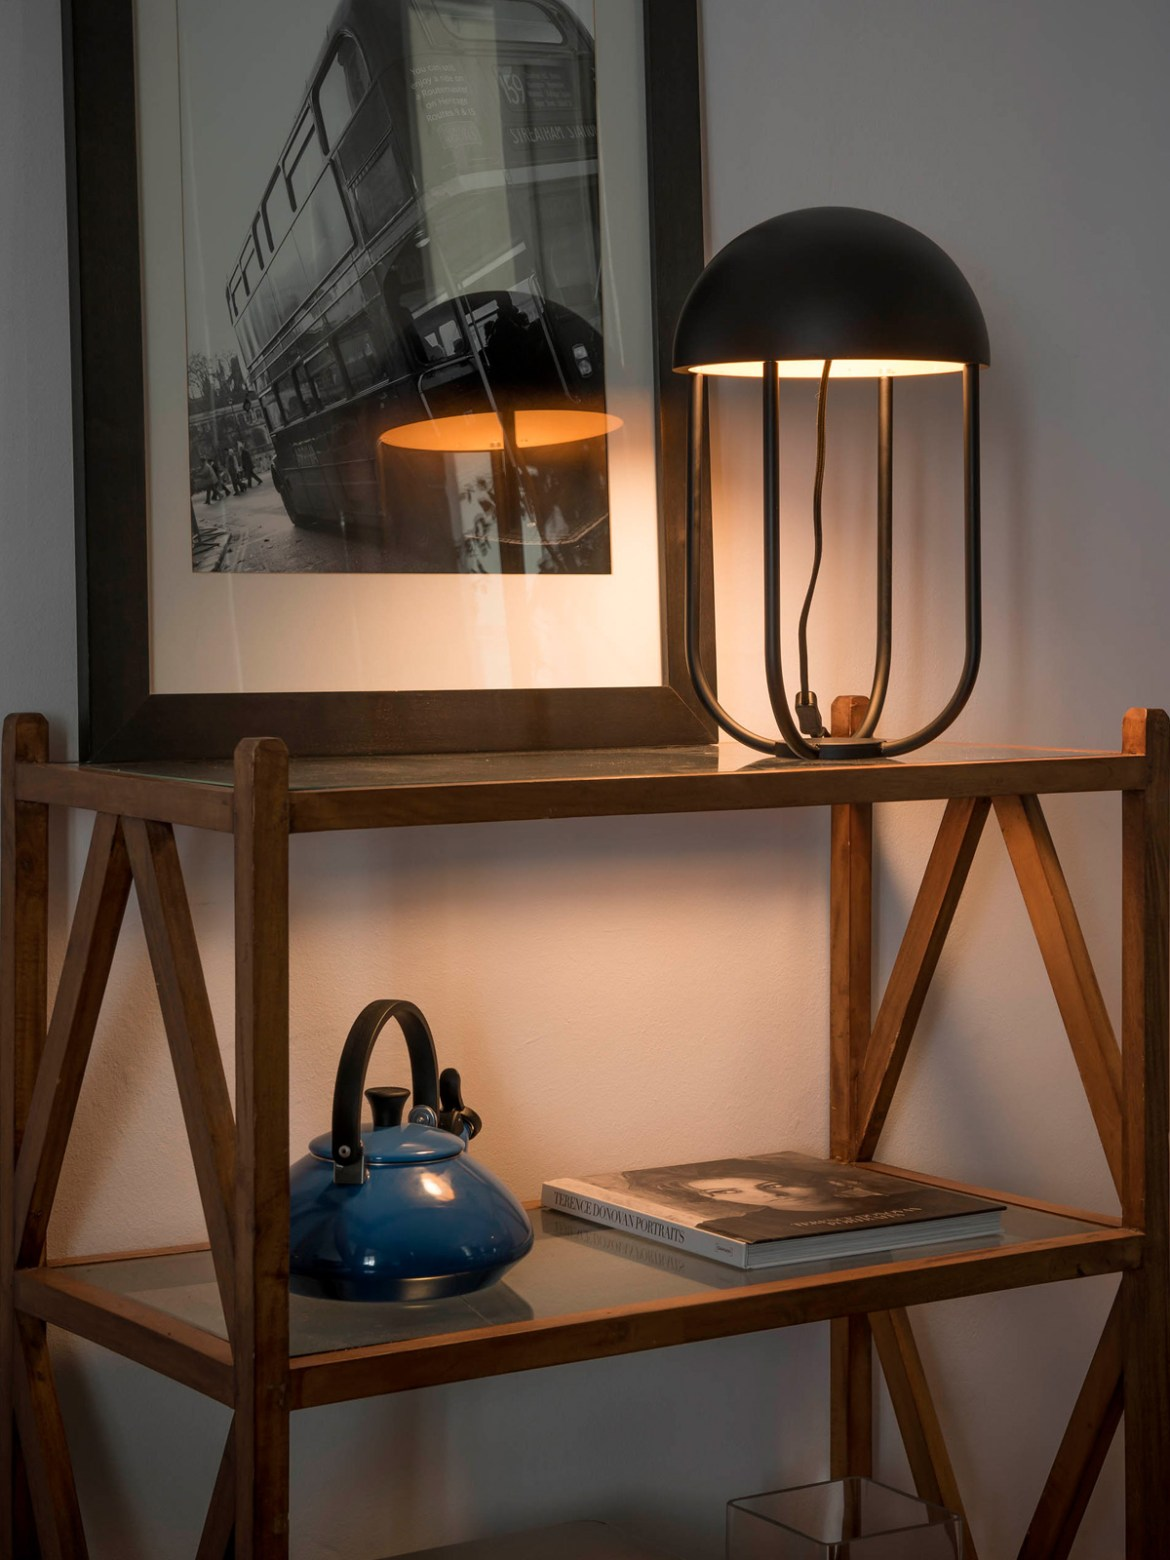 DesignOrt Blog: Designer im Portrait: Nahtrang LED Tischlampe Jellyfish Faro spanisches Design